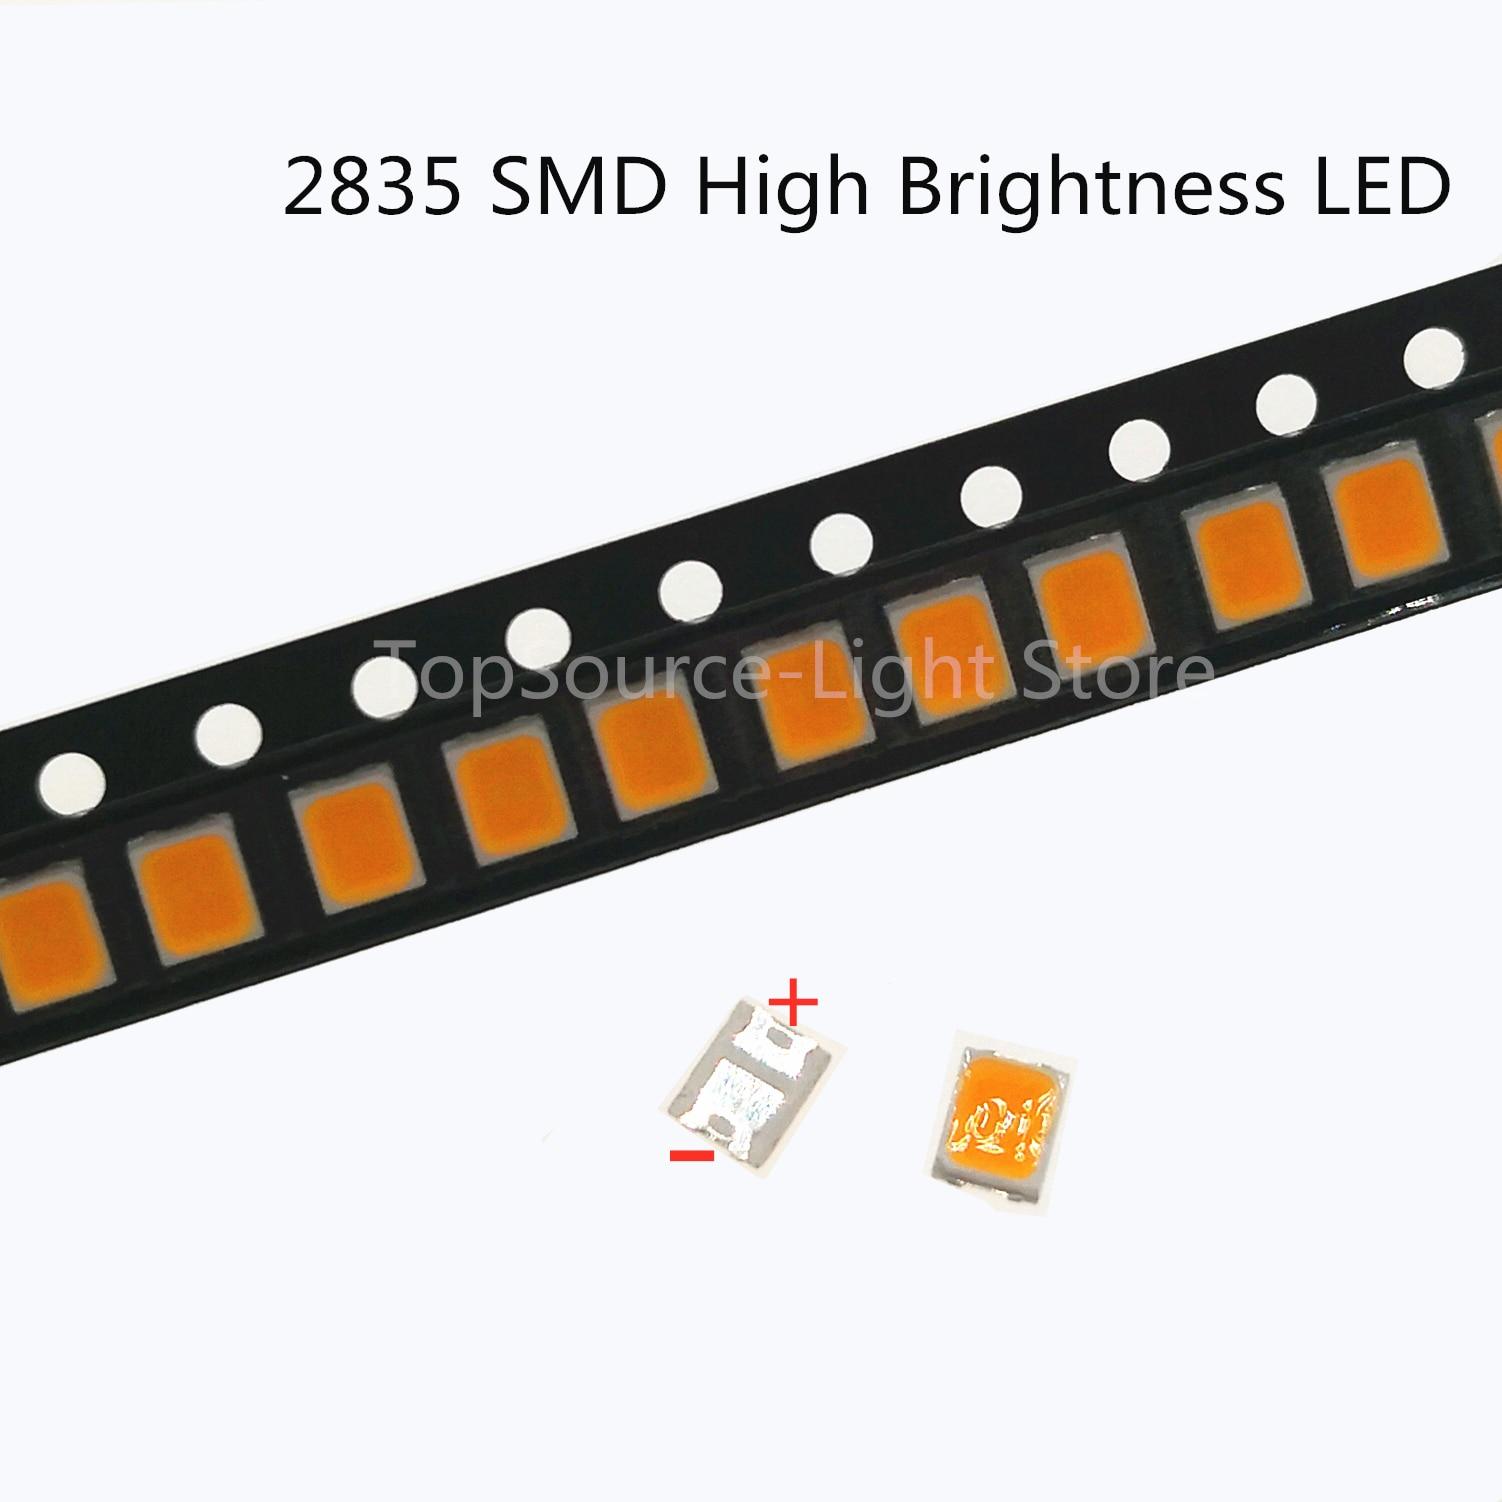 100PCS SMD SMT 3528 White LED Super bright White LED lamp Bulb NEW